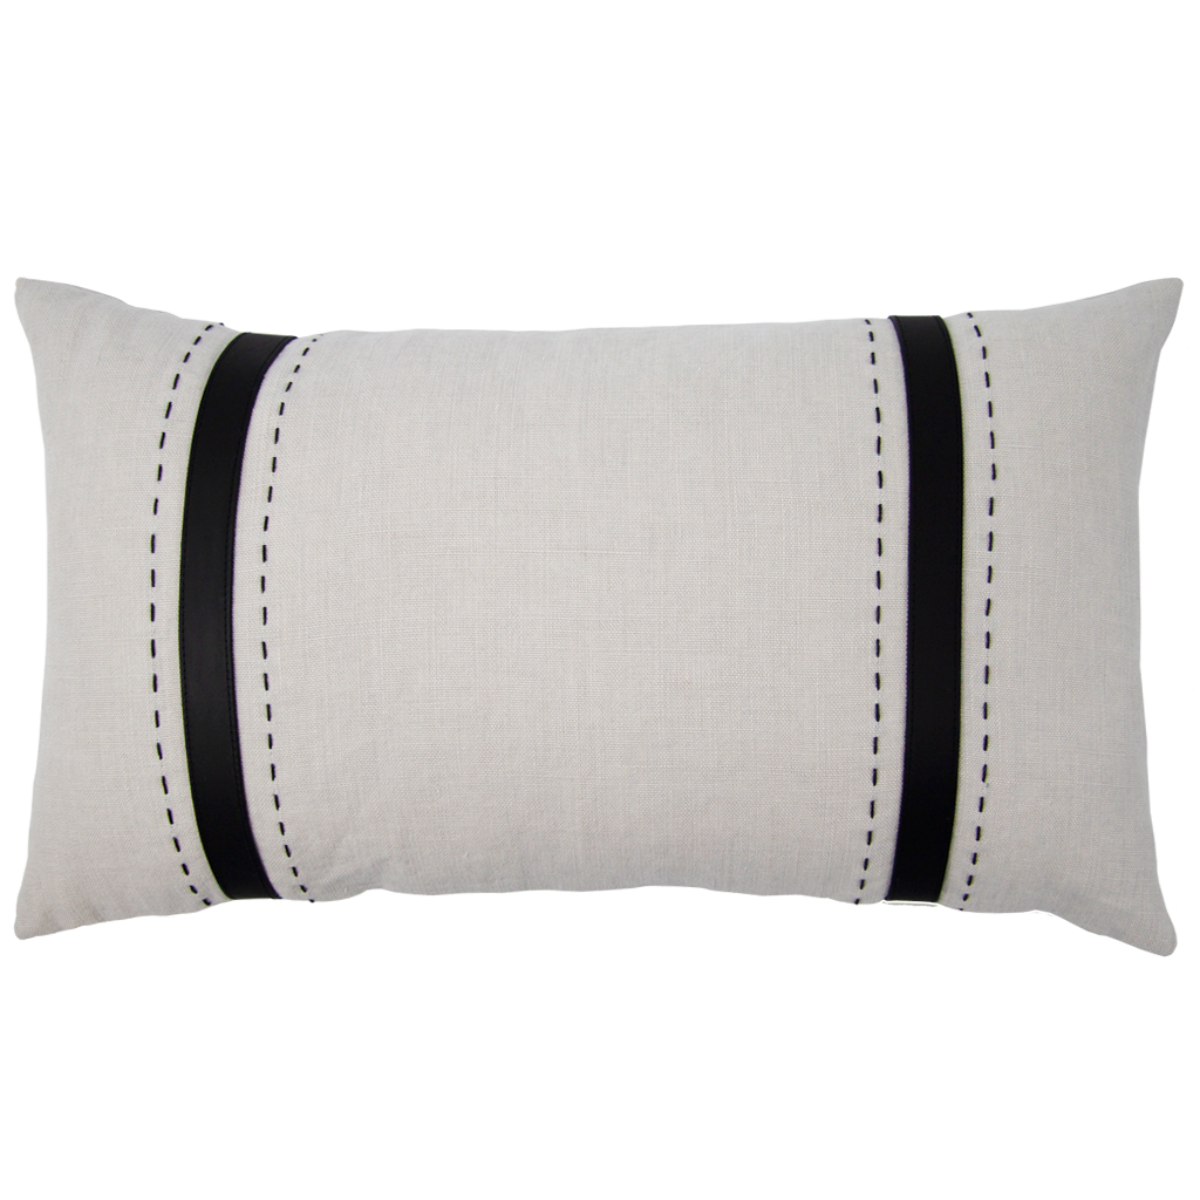 de Le Cuona | Bracken Cushion With Leather Straps Mushroom